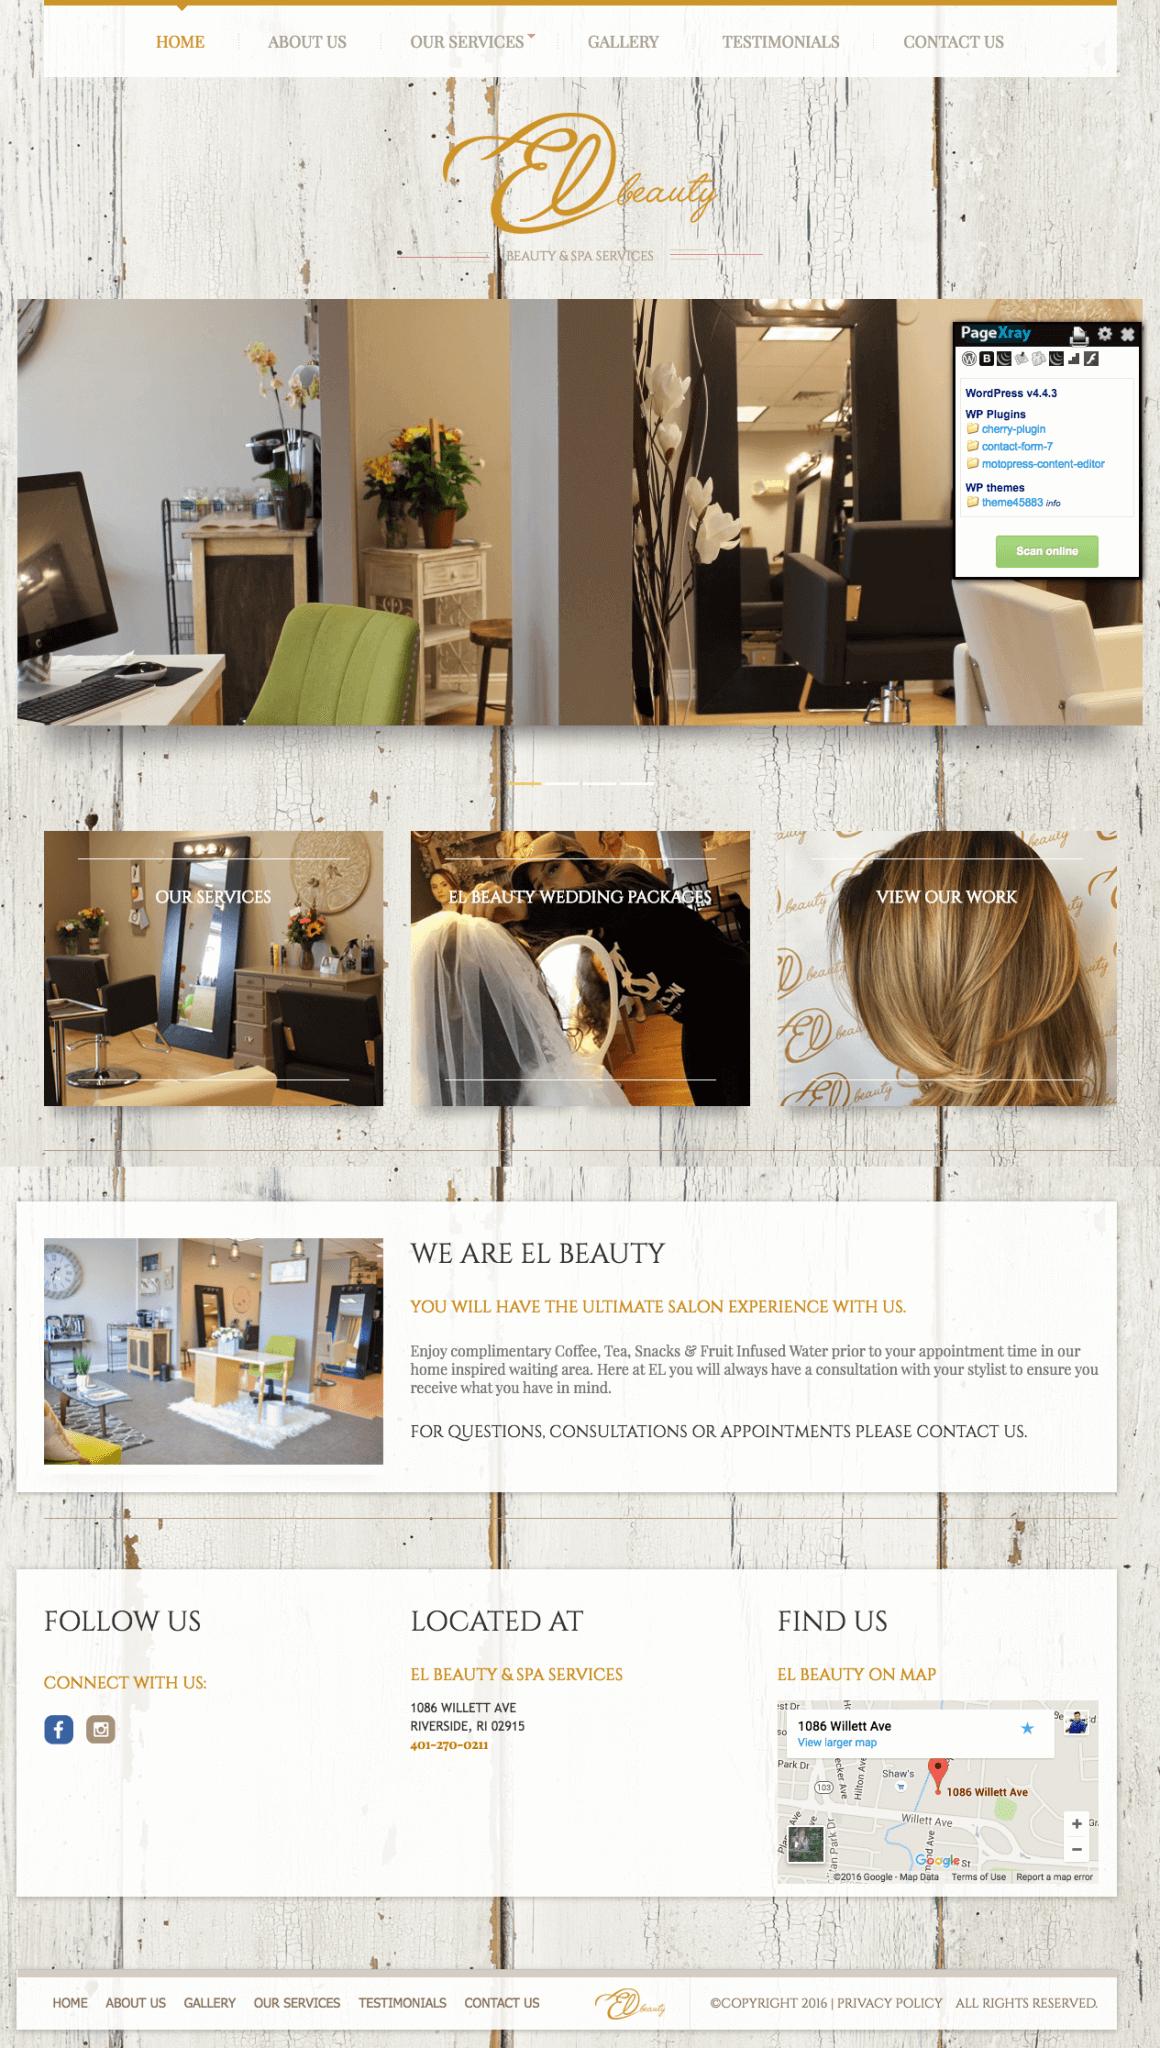 Elbeauty   Beauty   Spa Services